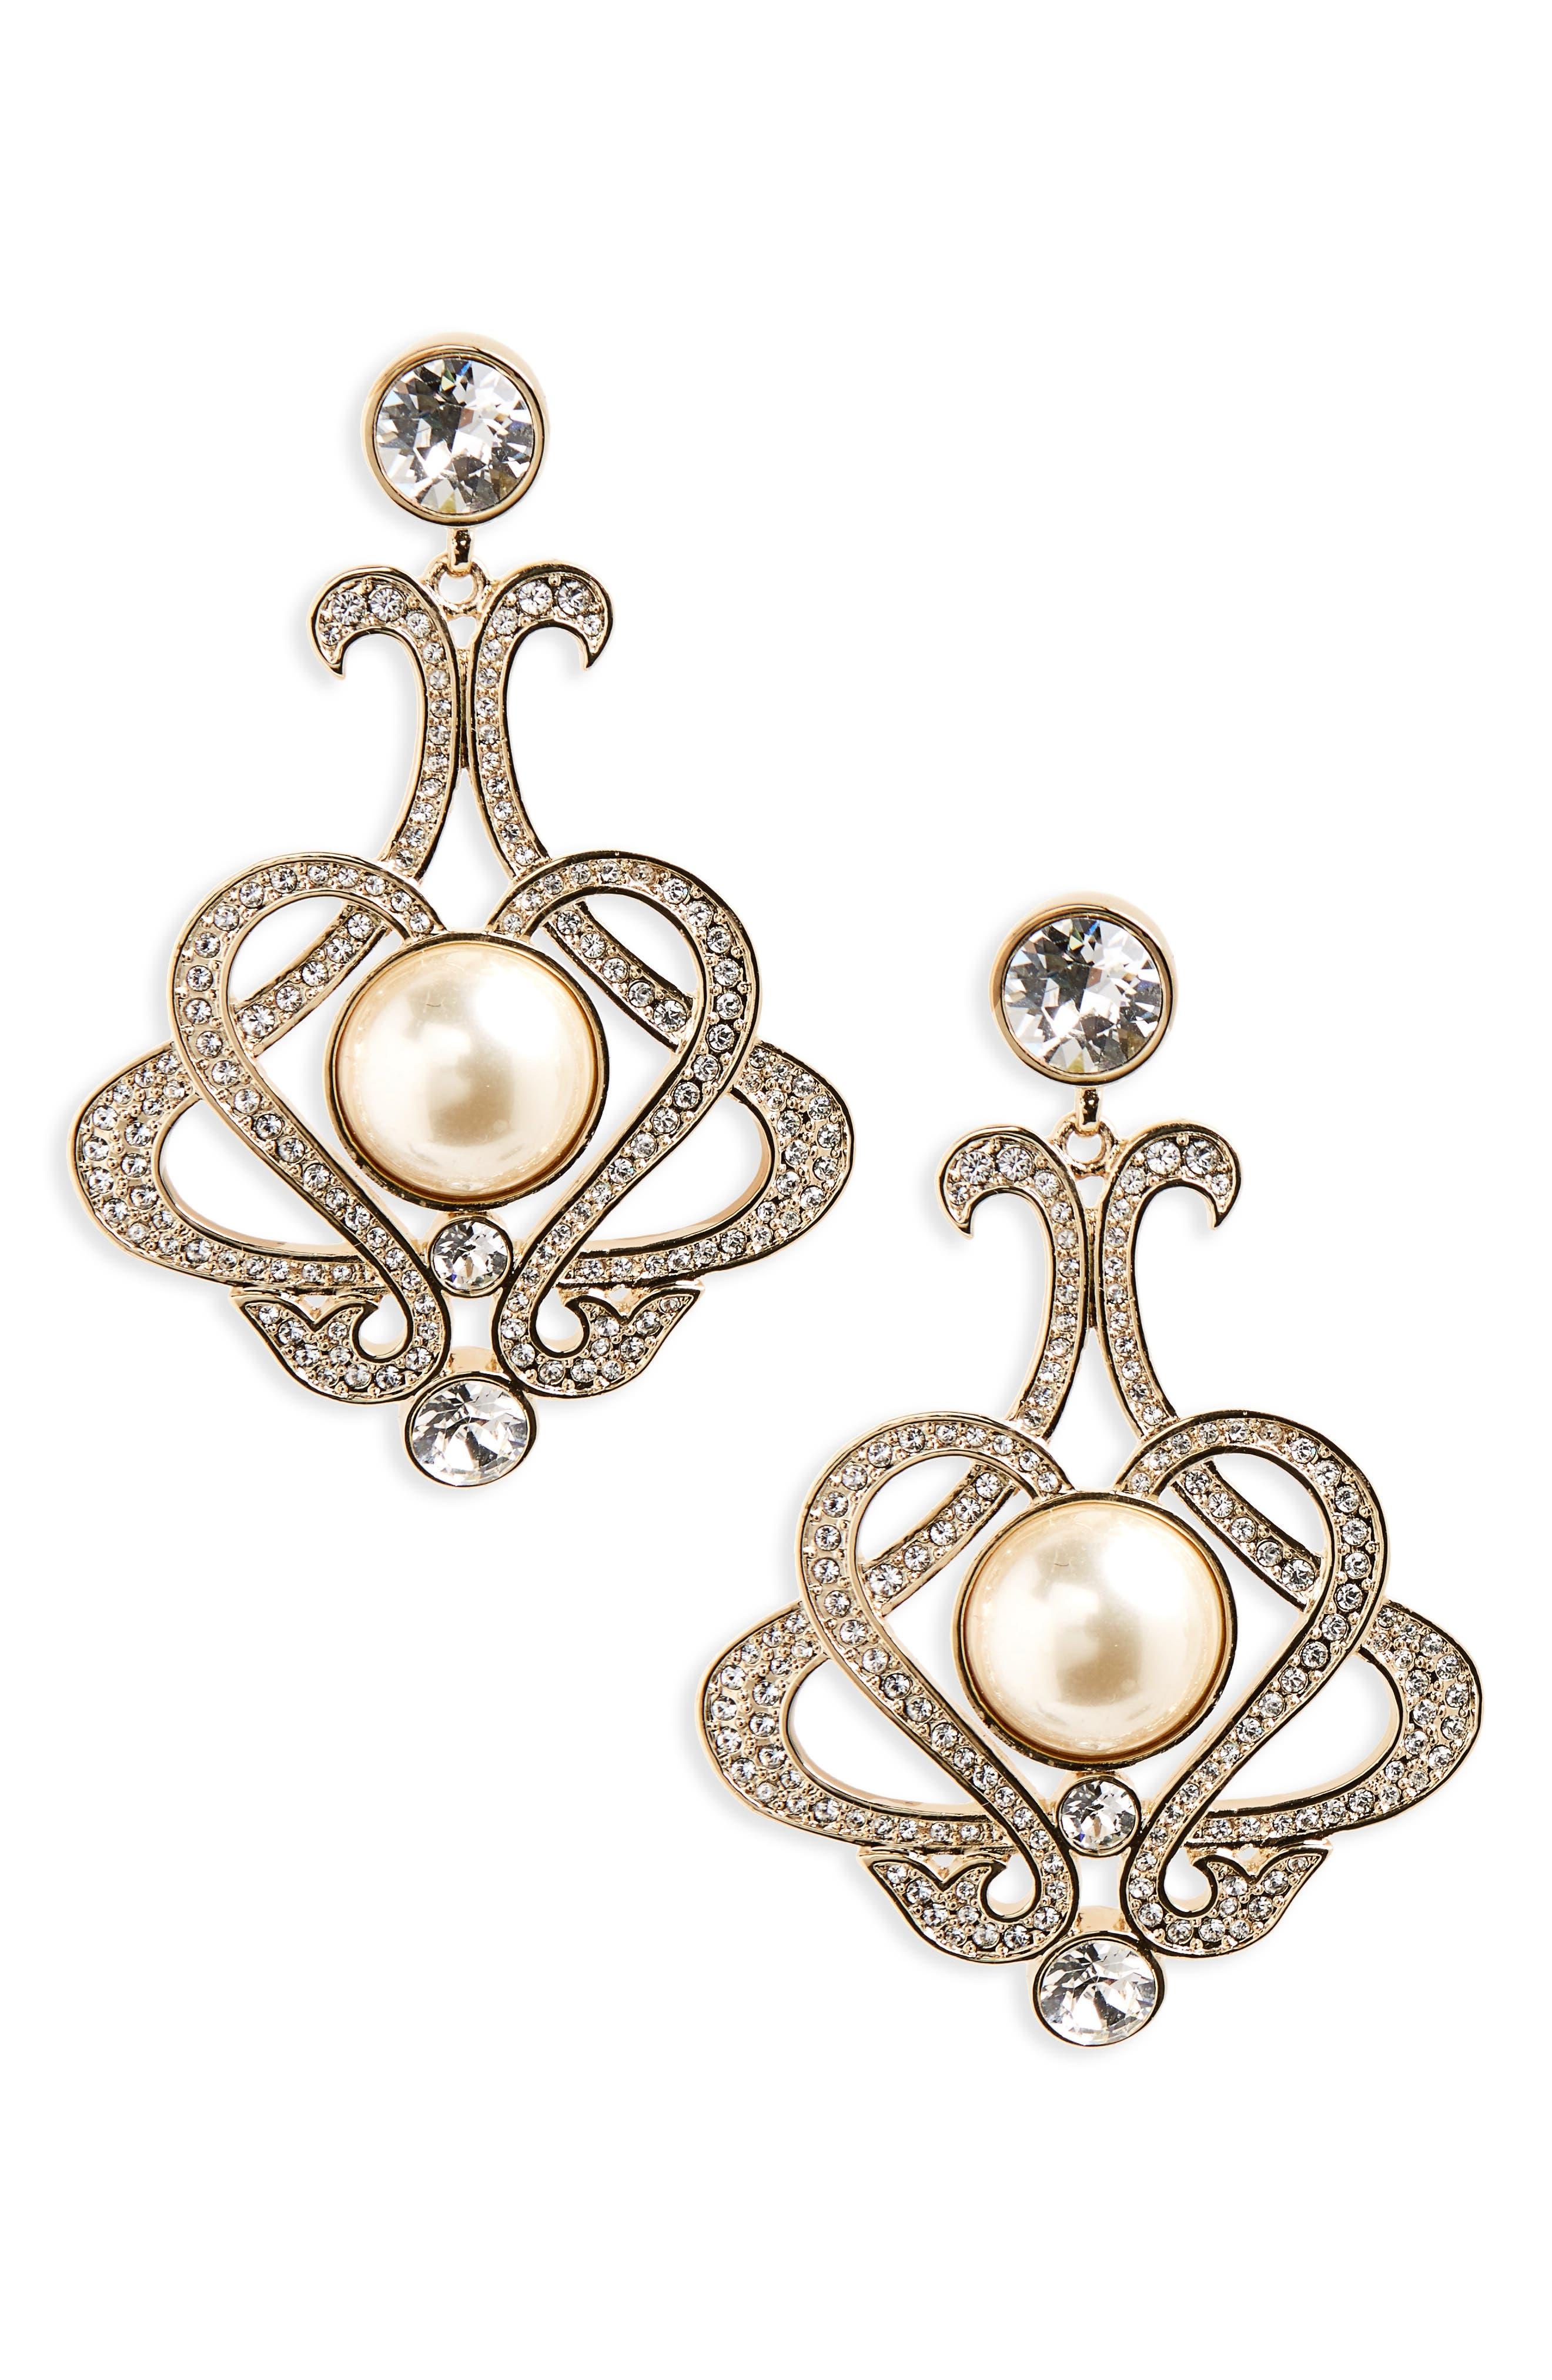 Main Image - Nina Crystal & Imitation Pearl Chandelier Earrings